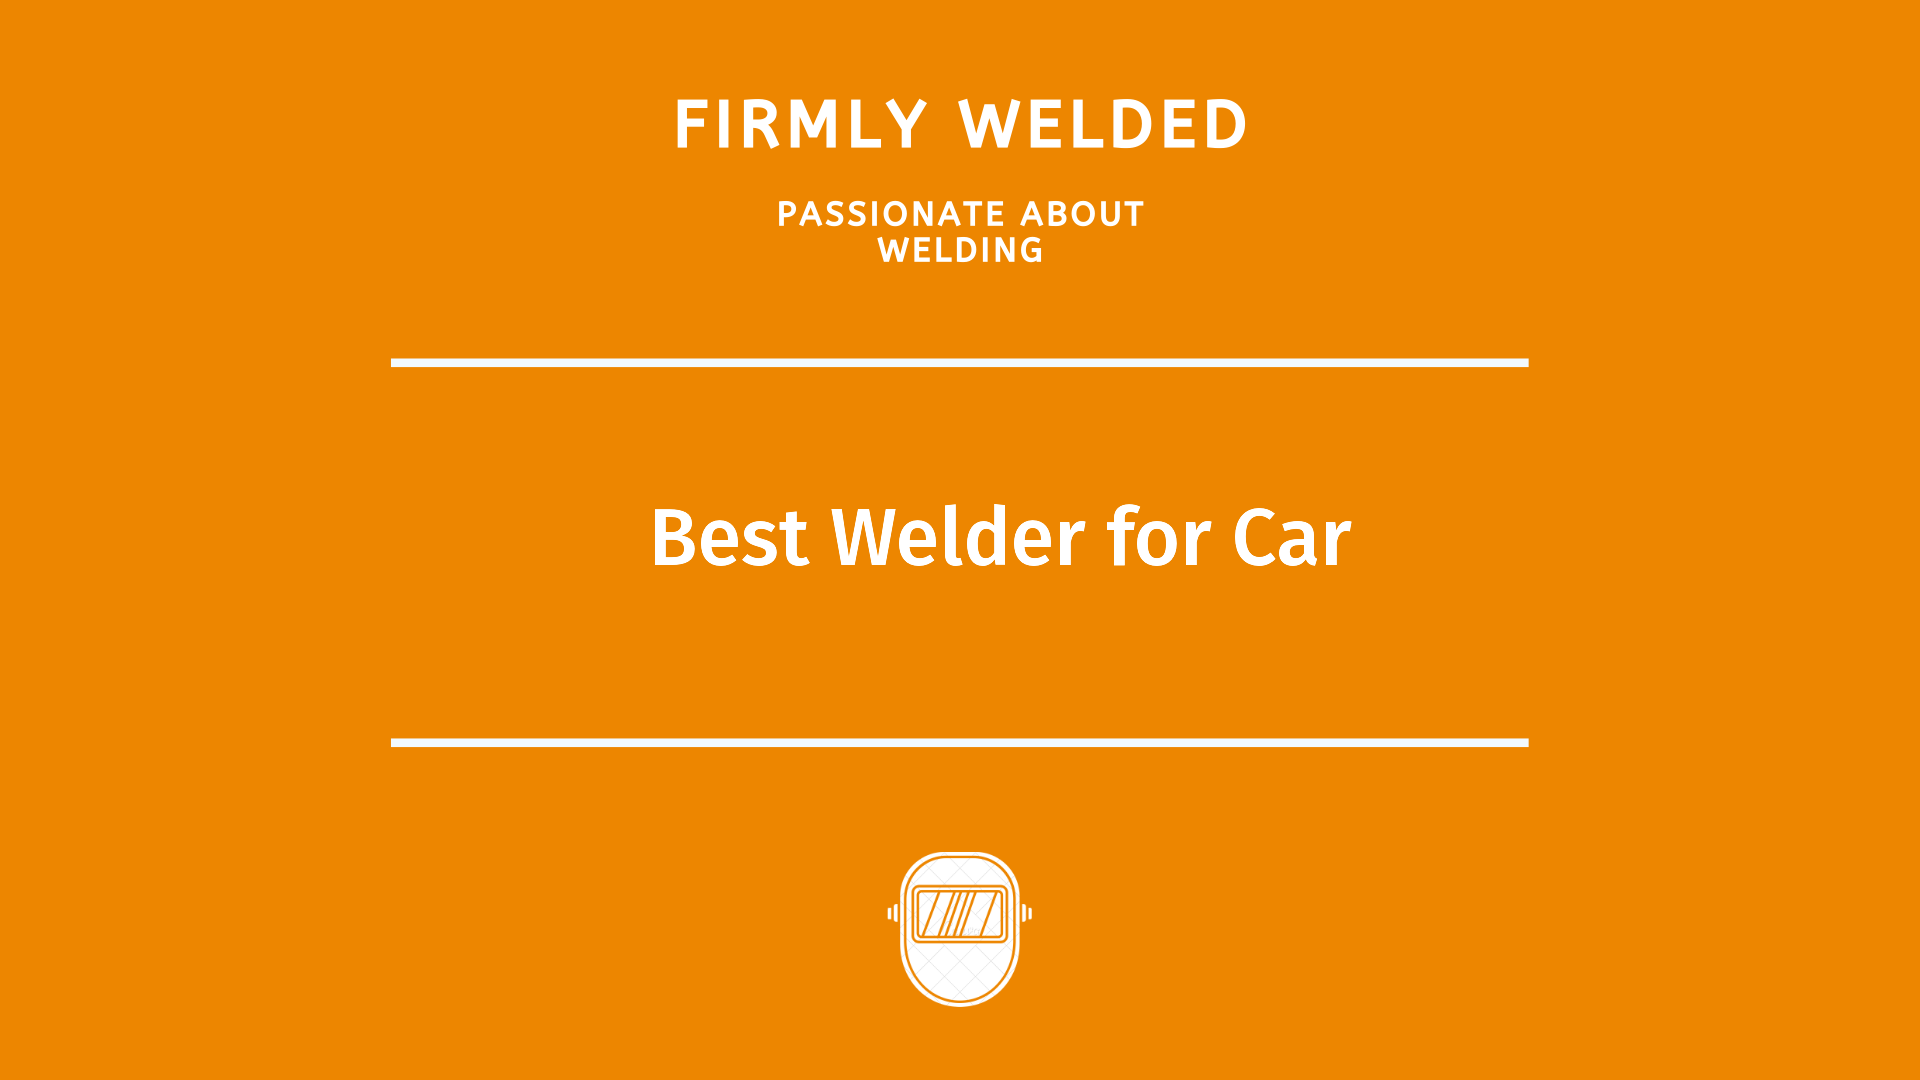 Best Welder for Car